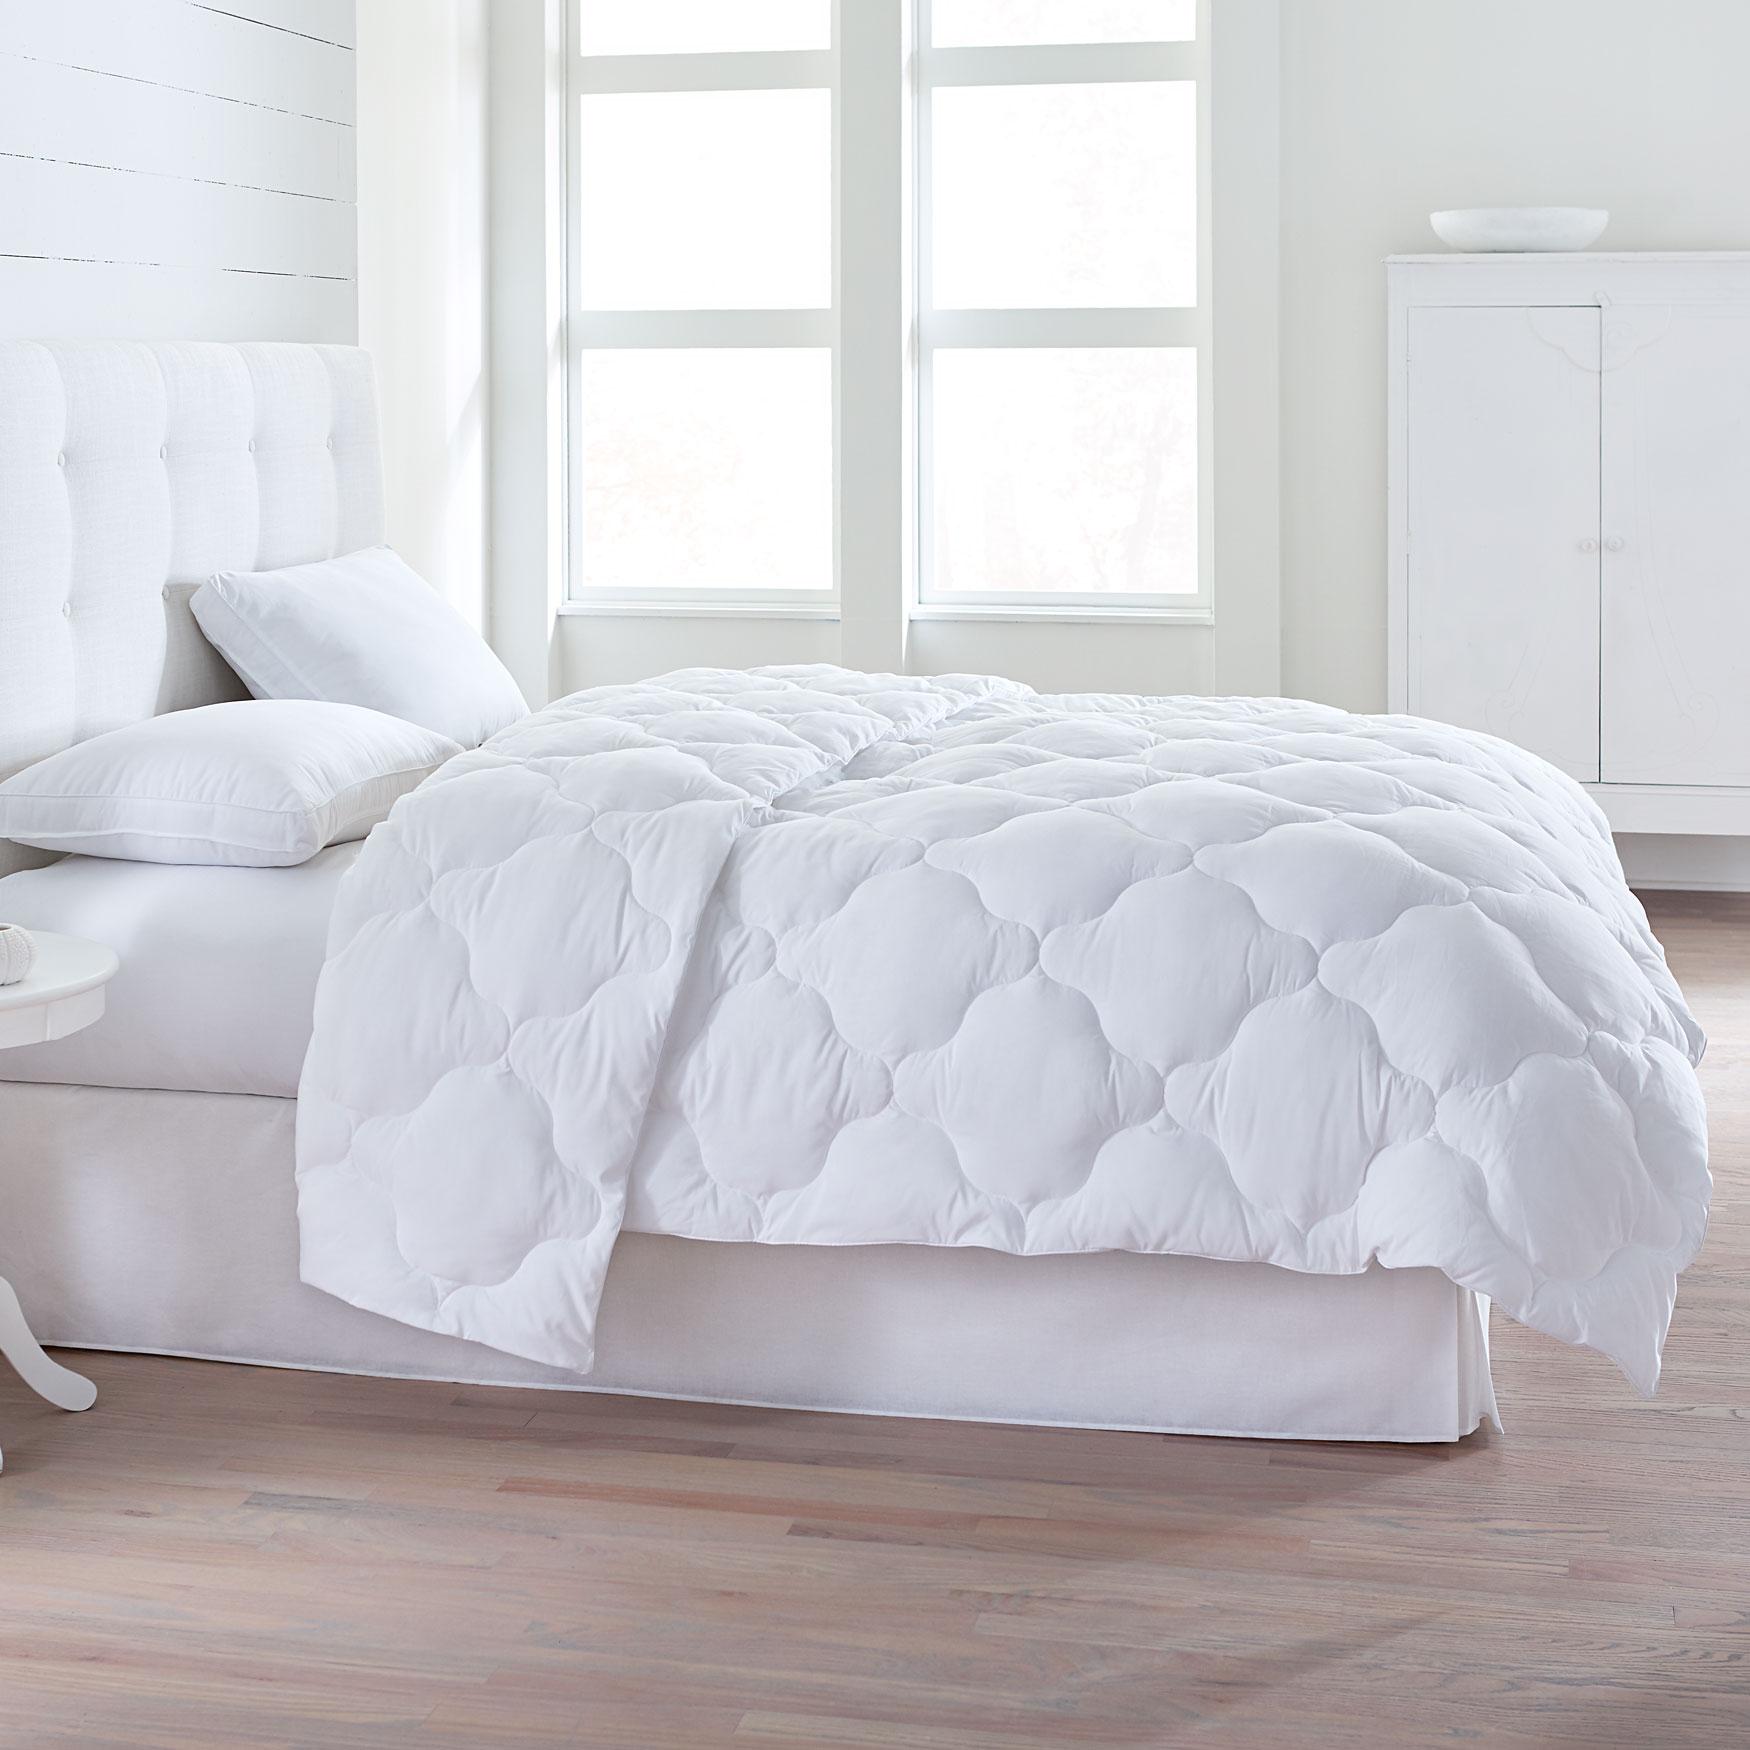 Dupont Duoloft Down Alternative Comforter Bedding